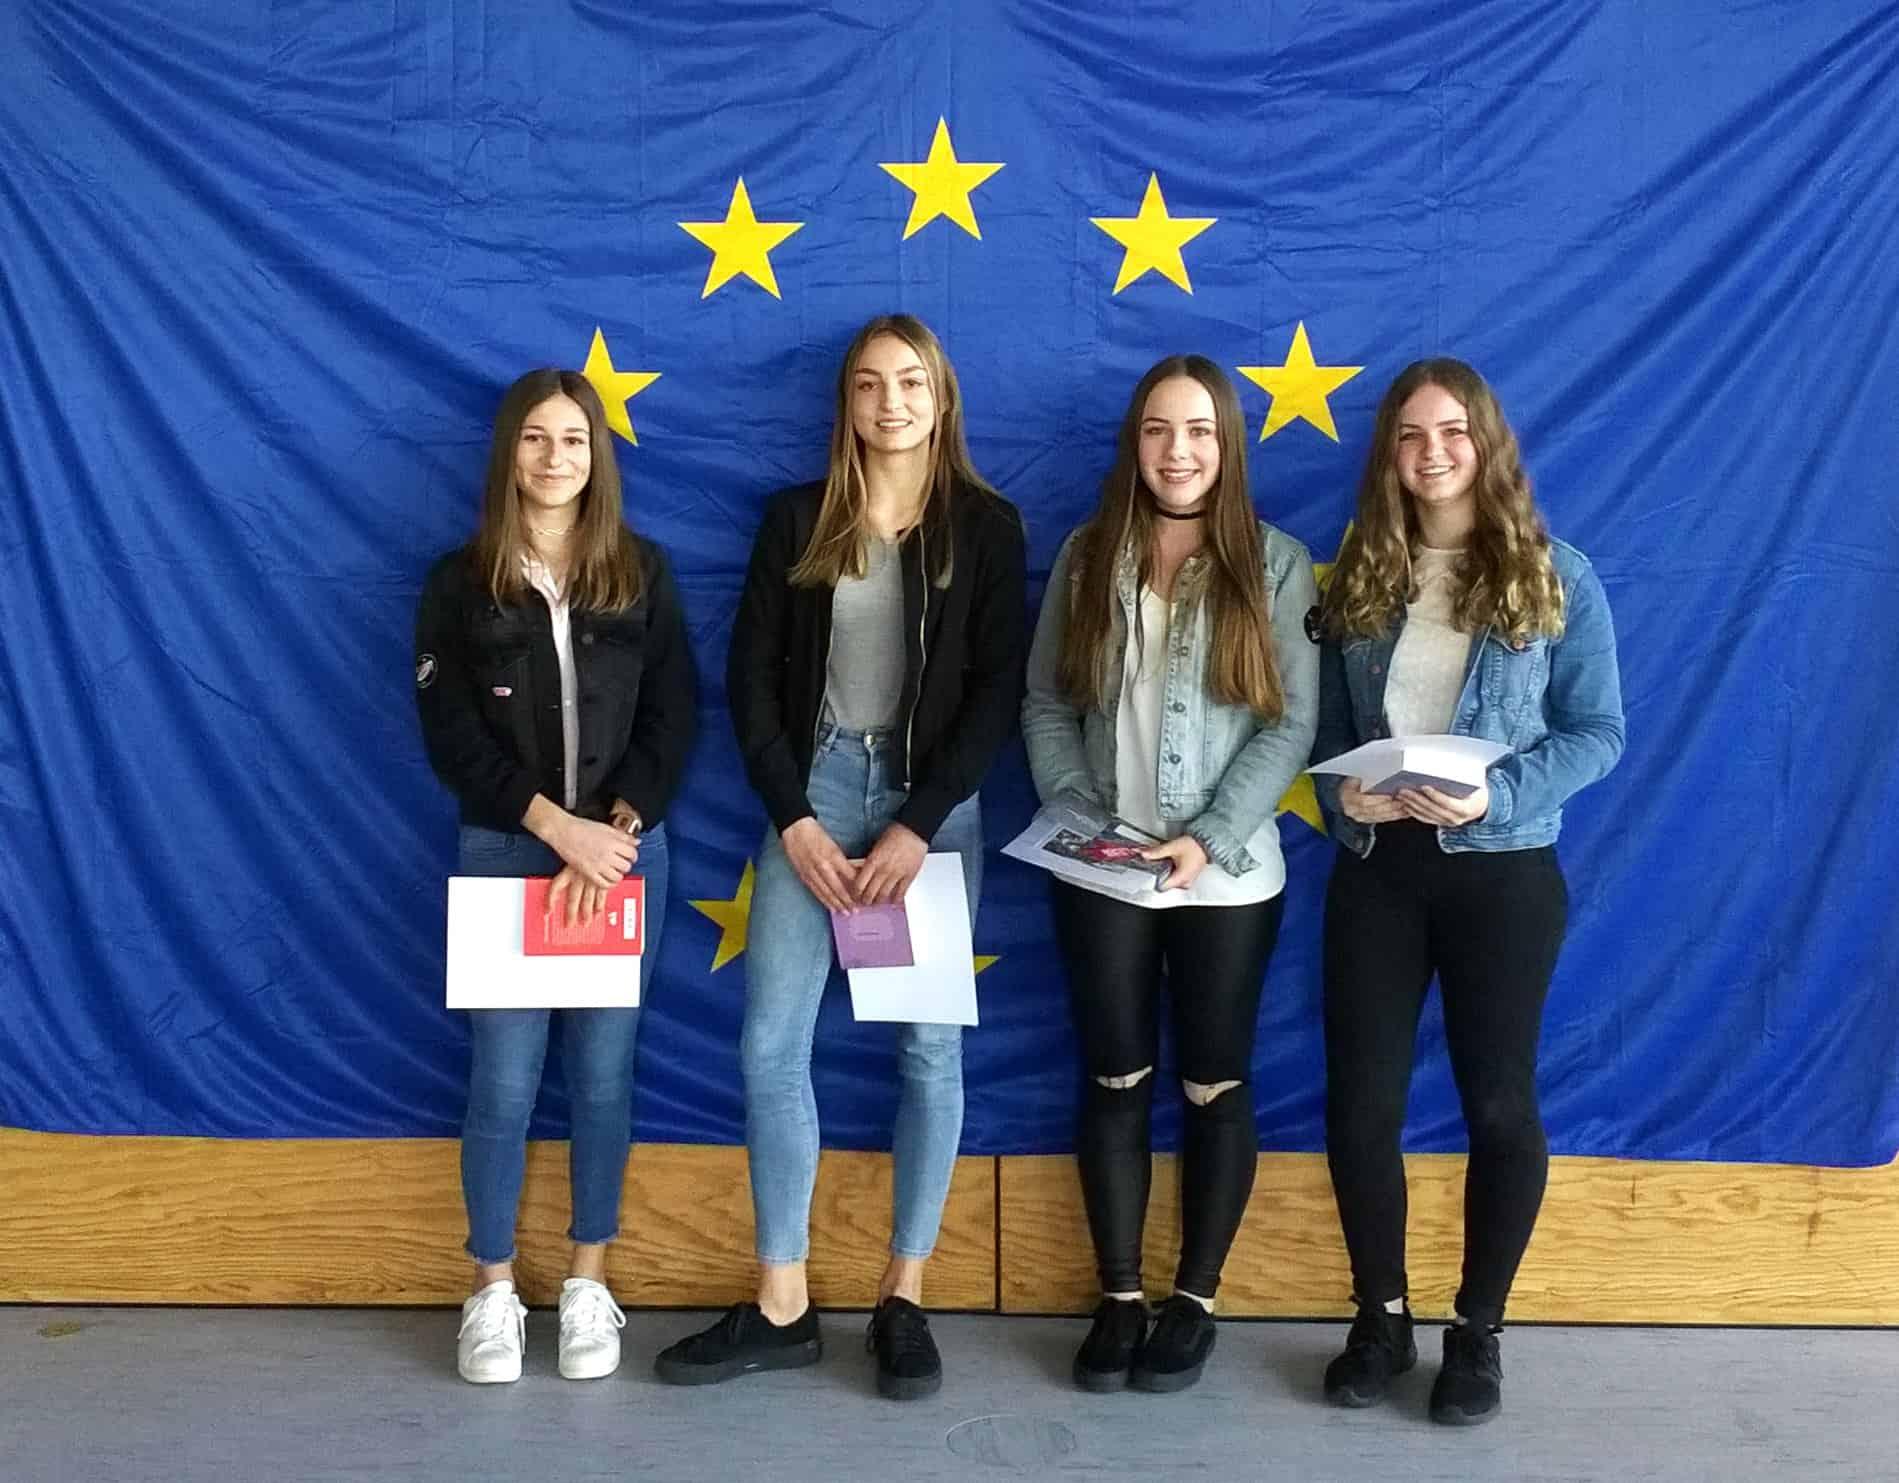 Schulkunst 2017: große Erfolge unserer Schüler